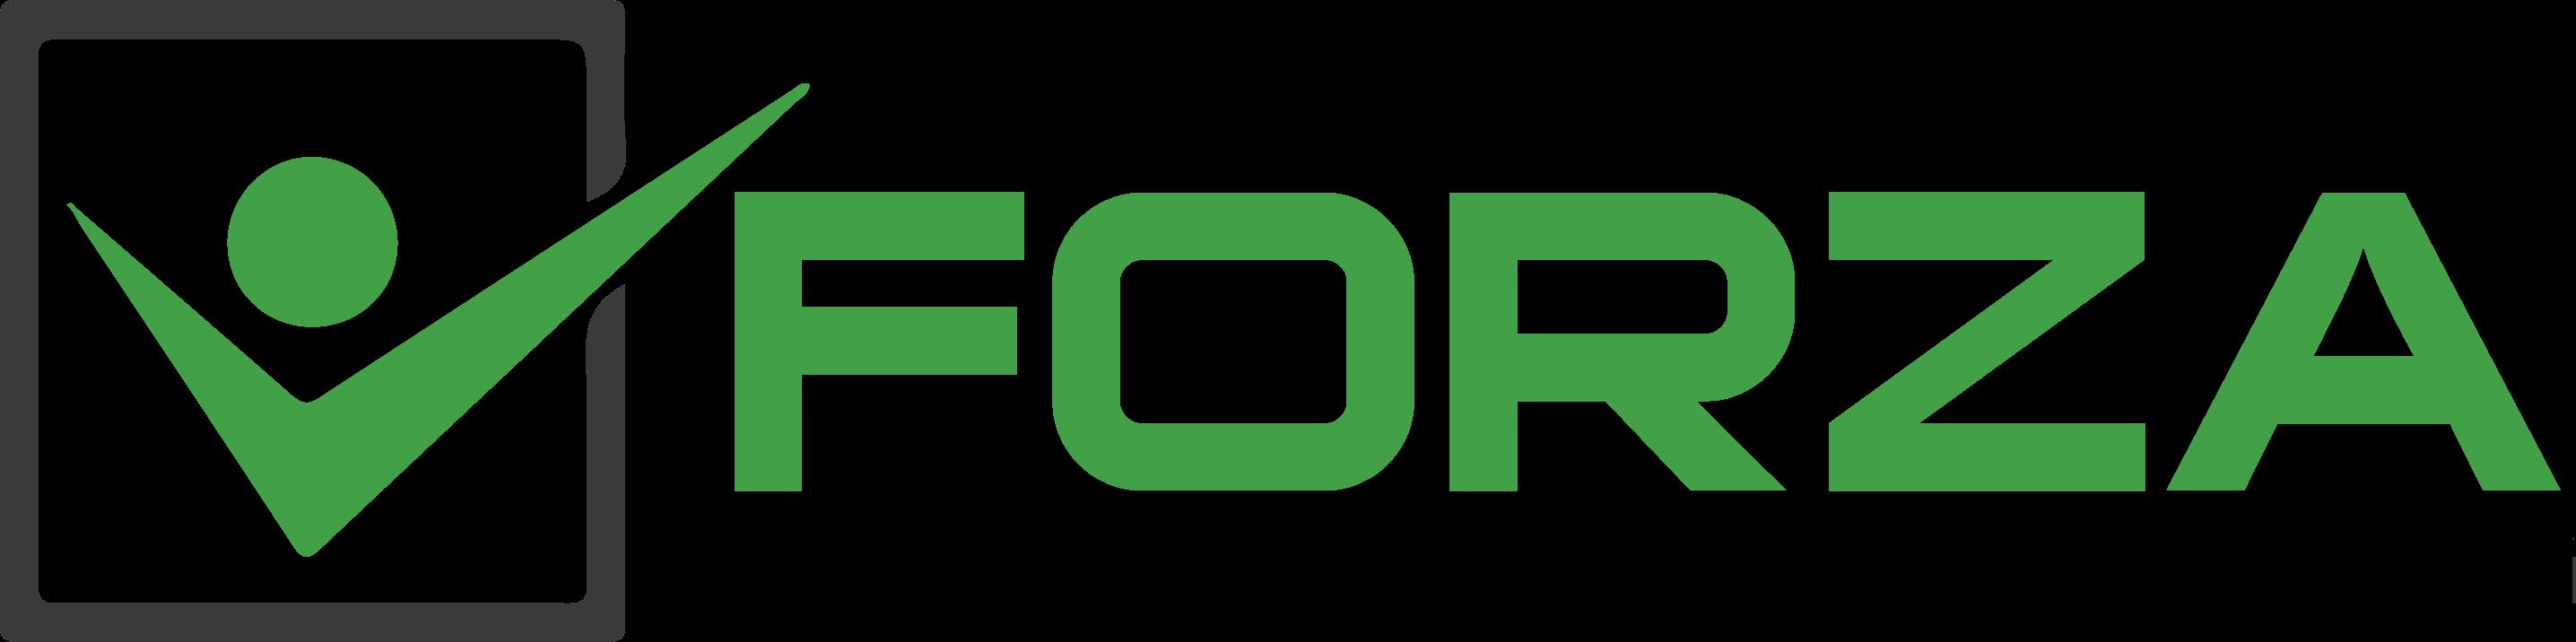 portland digital marketing agency services forza logo transparent